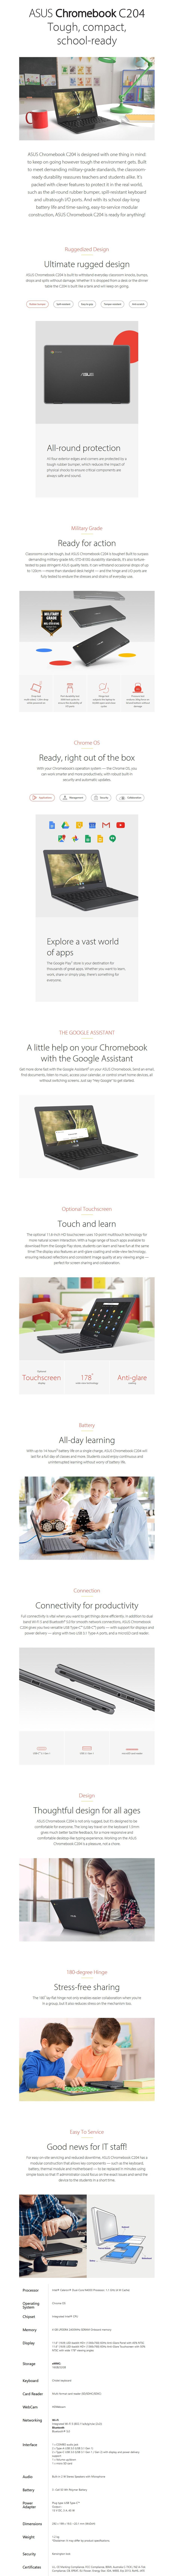 asus-chromebook-c204ma-116-laptop-n4000-4gb-32gb-chromeos-touch-ac36911-4.jpg